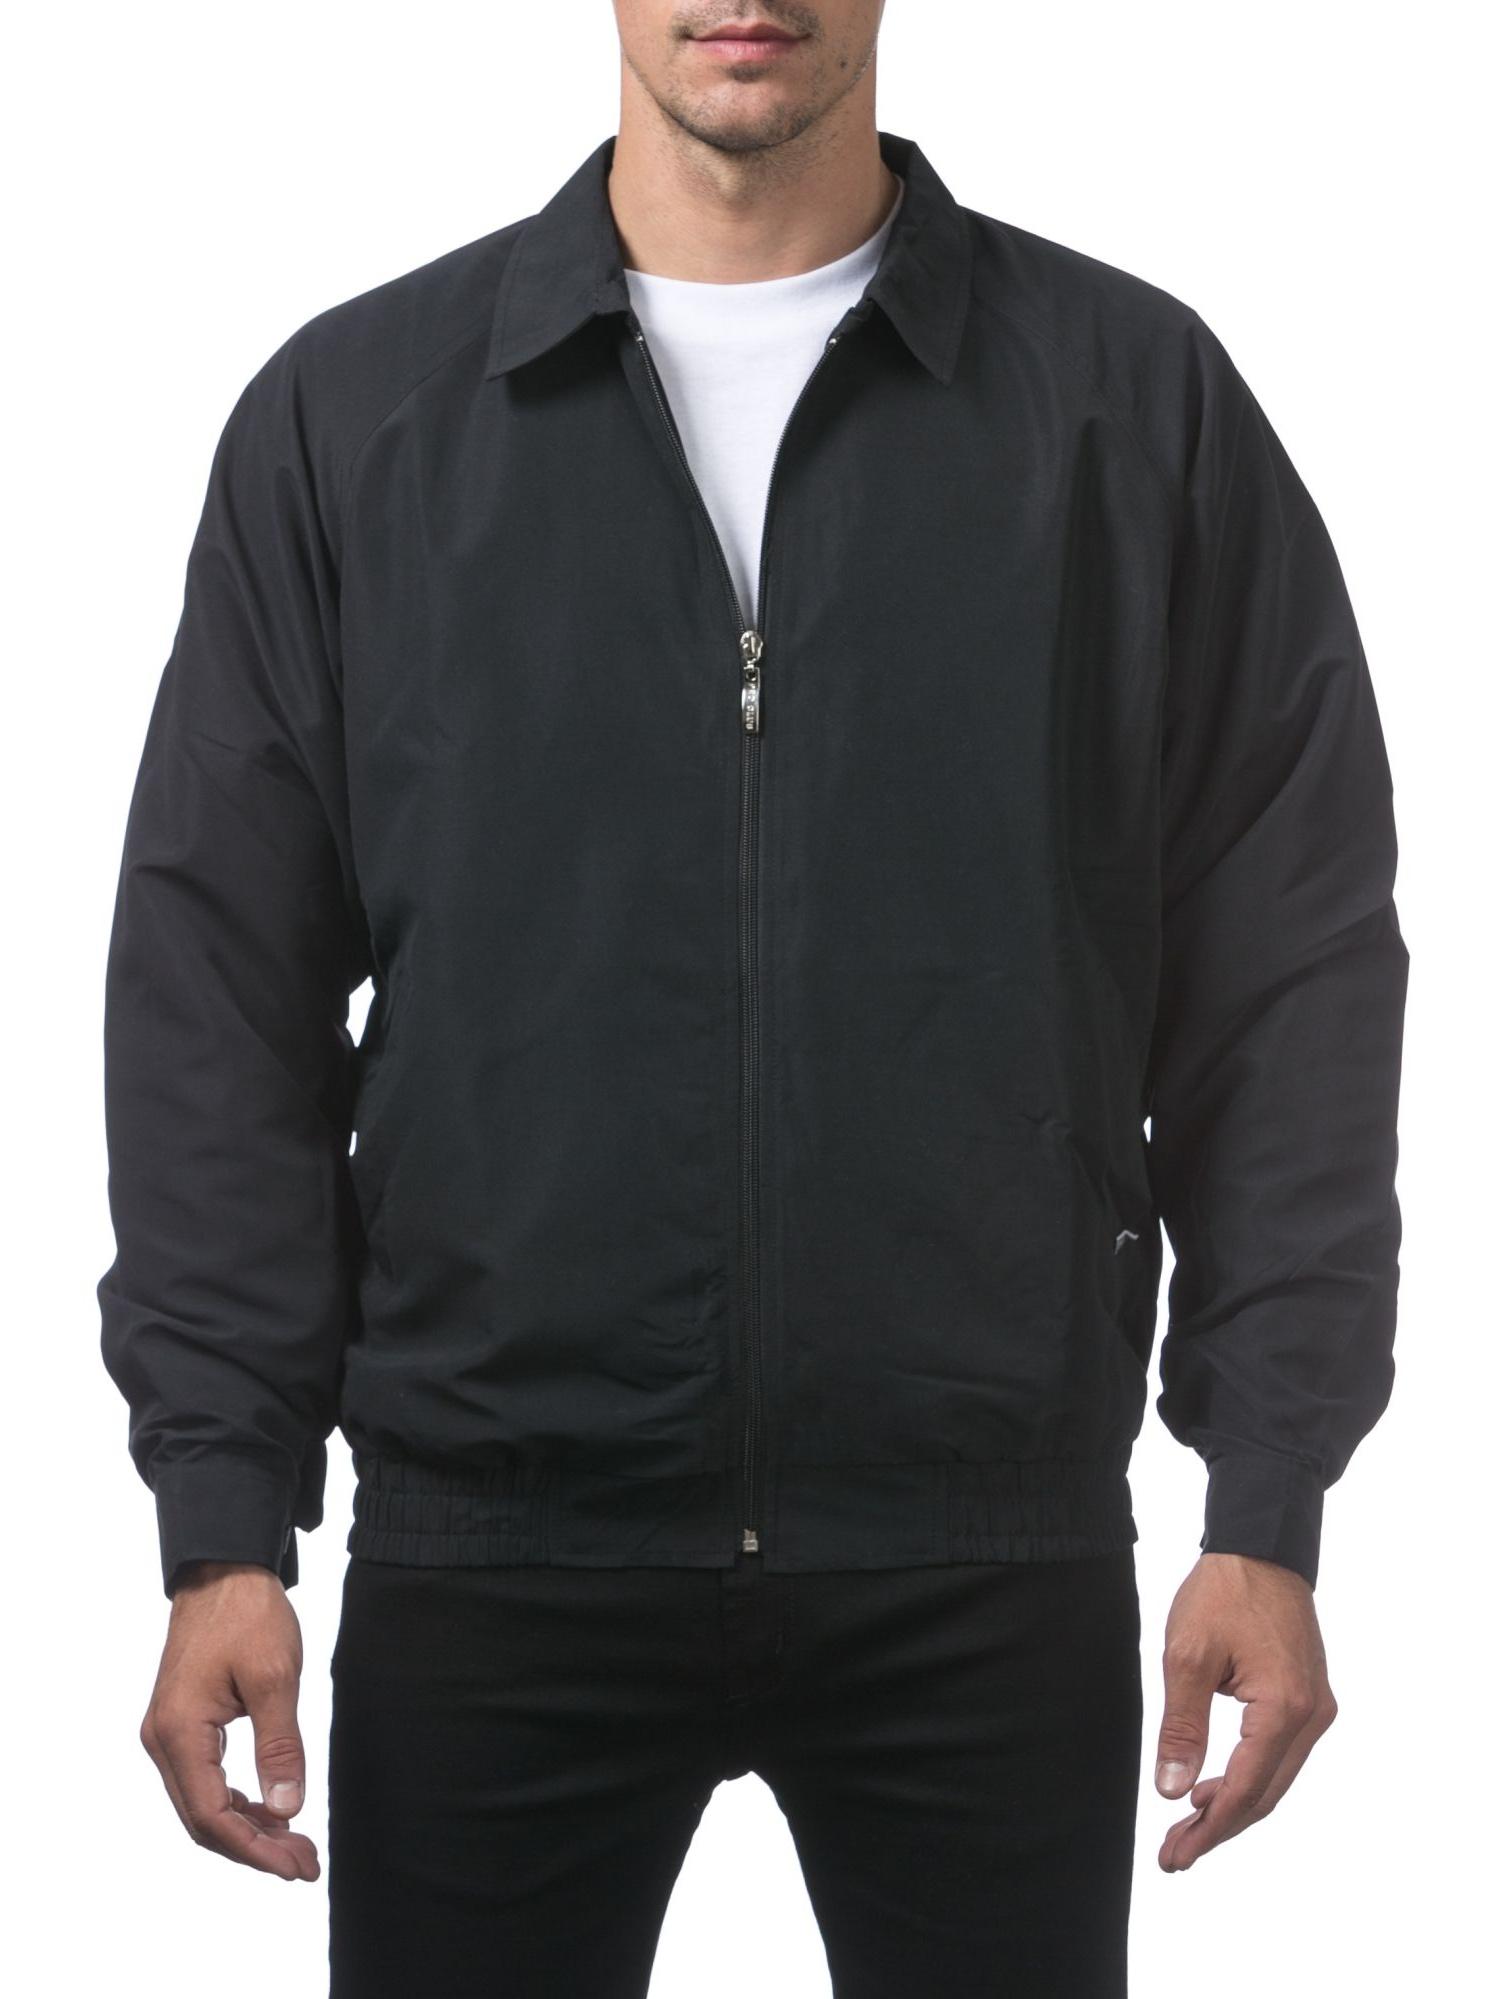 Pro Club Men's Spring/Fall Jacket, Small, Black